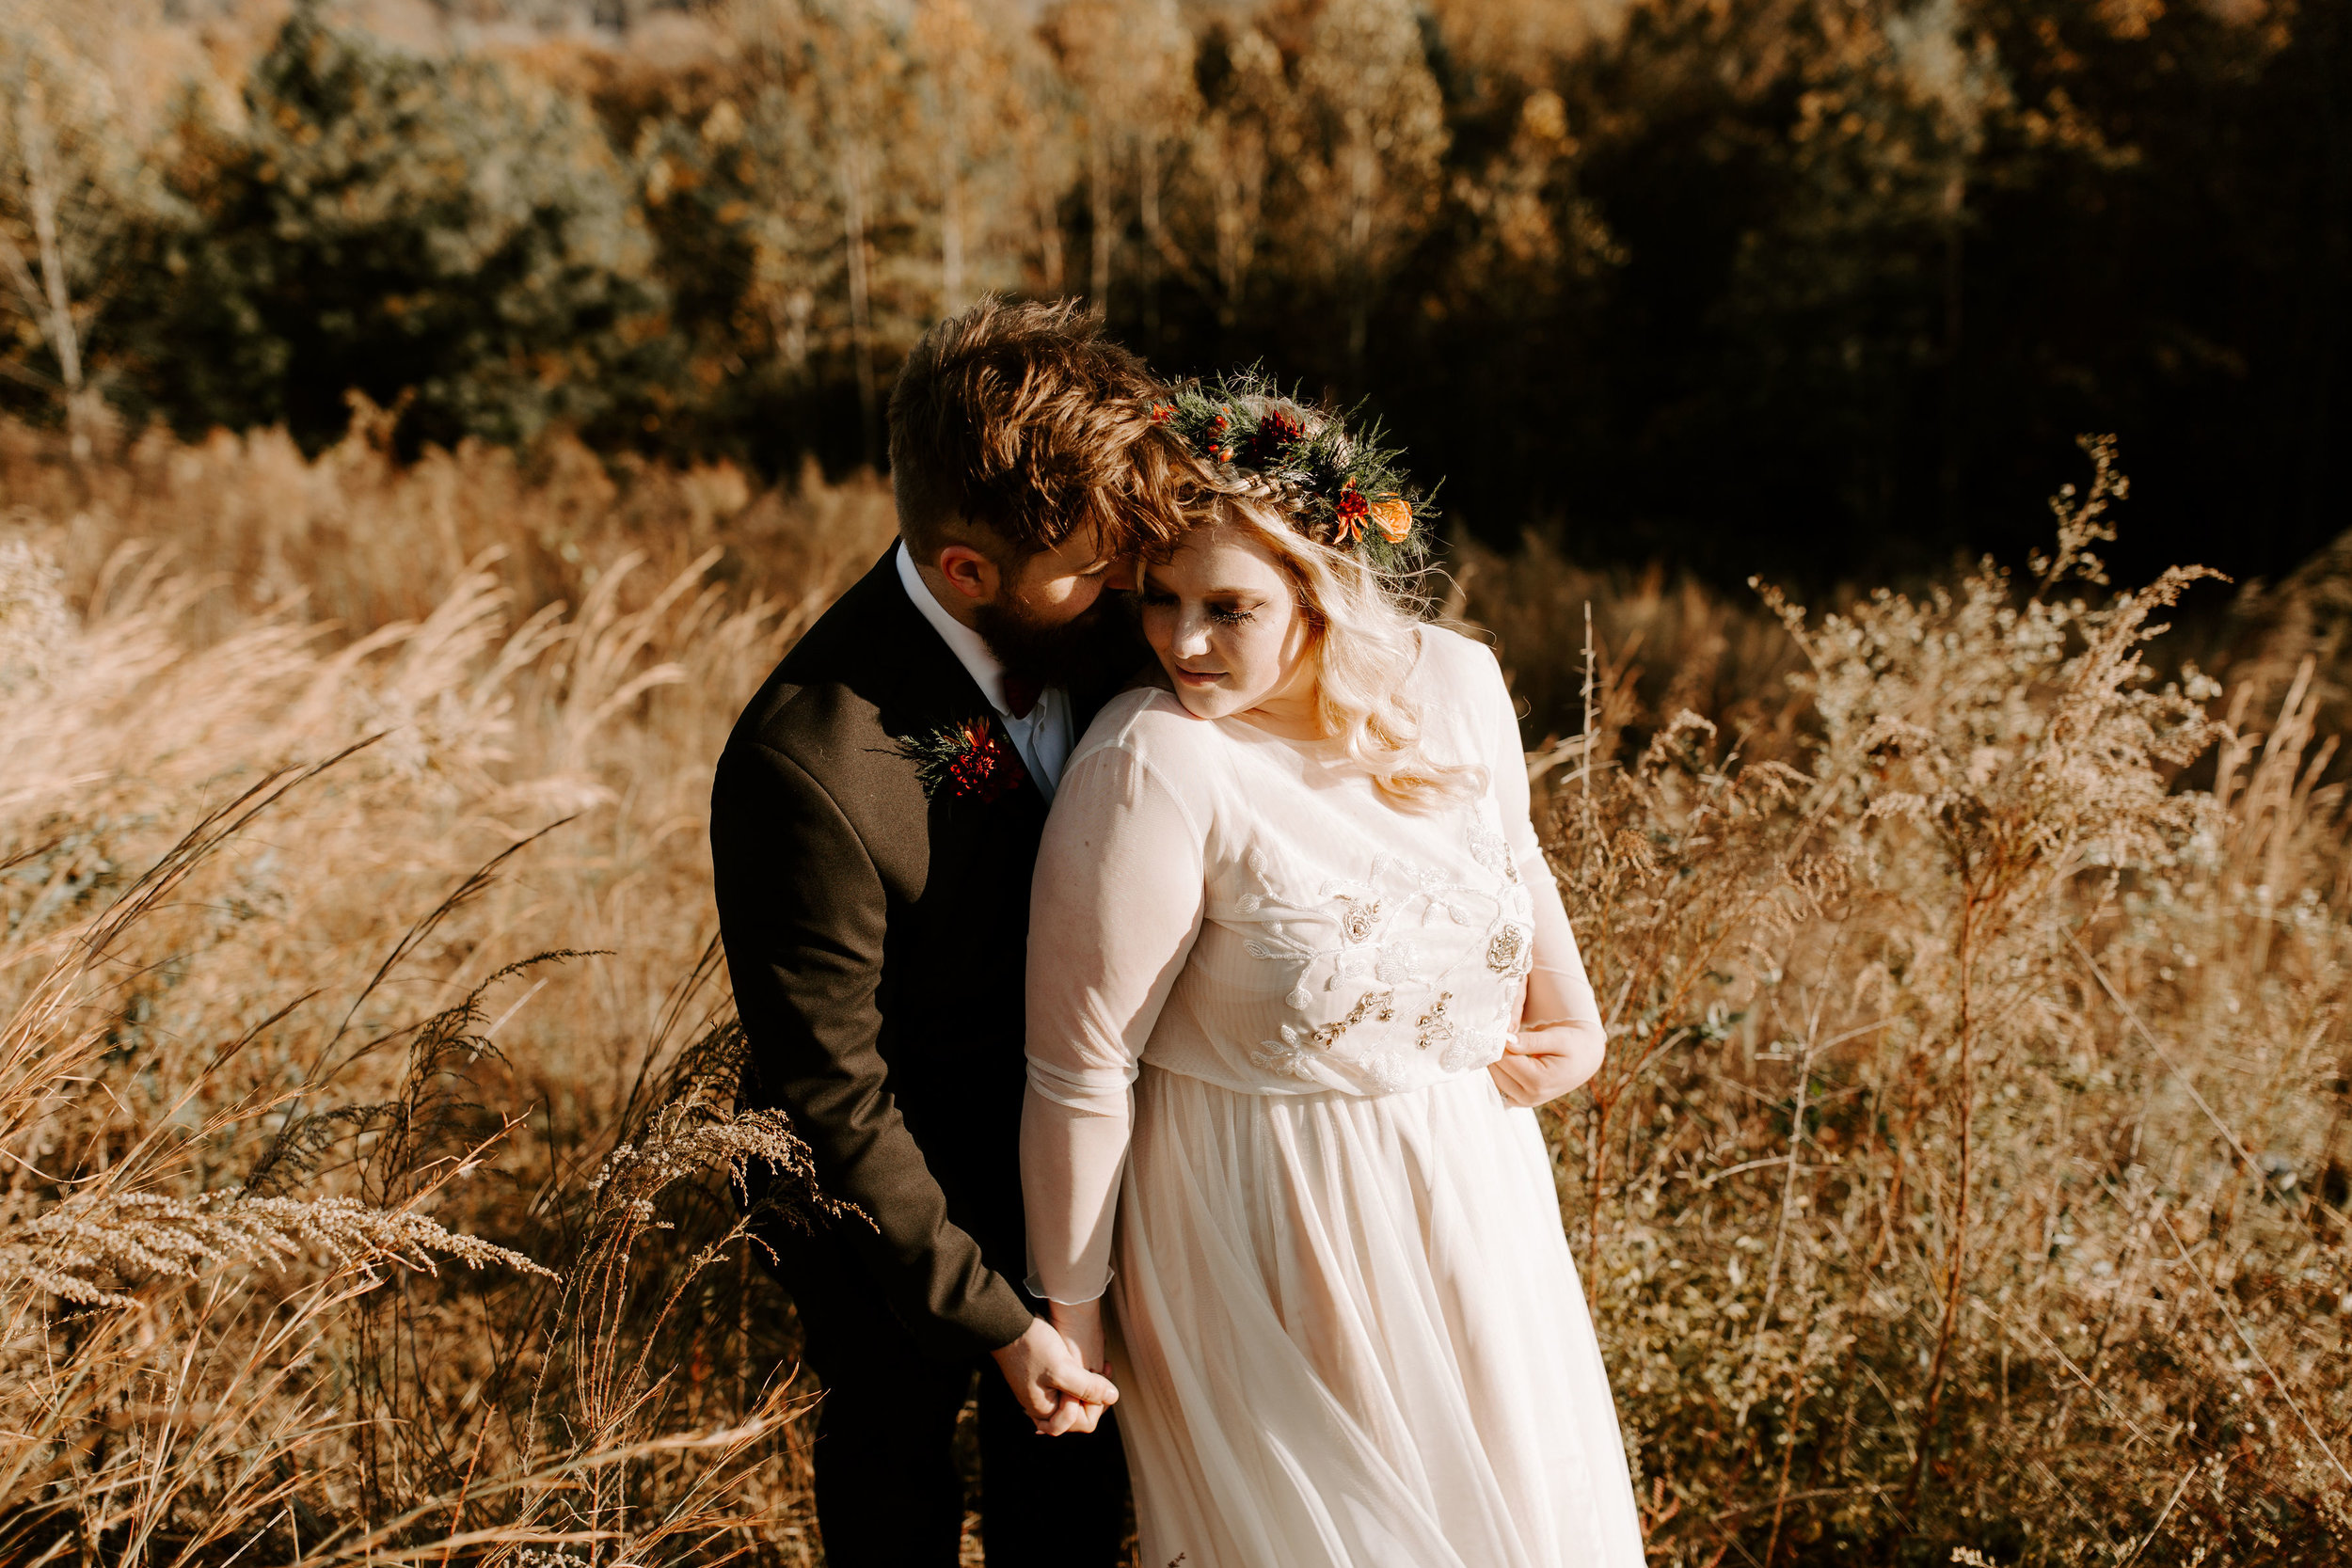 Shaye & Michaela Halcomb - November 10, 2018Allie Chambers Photography